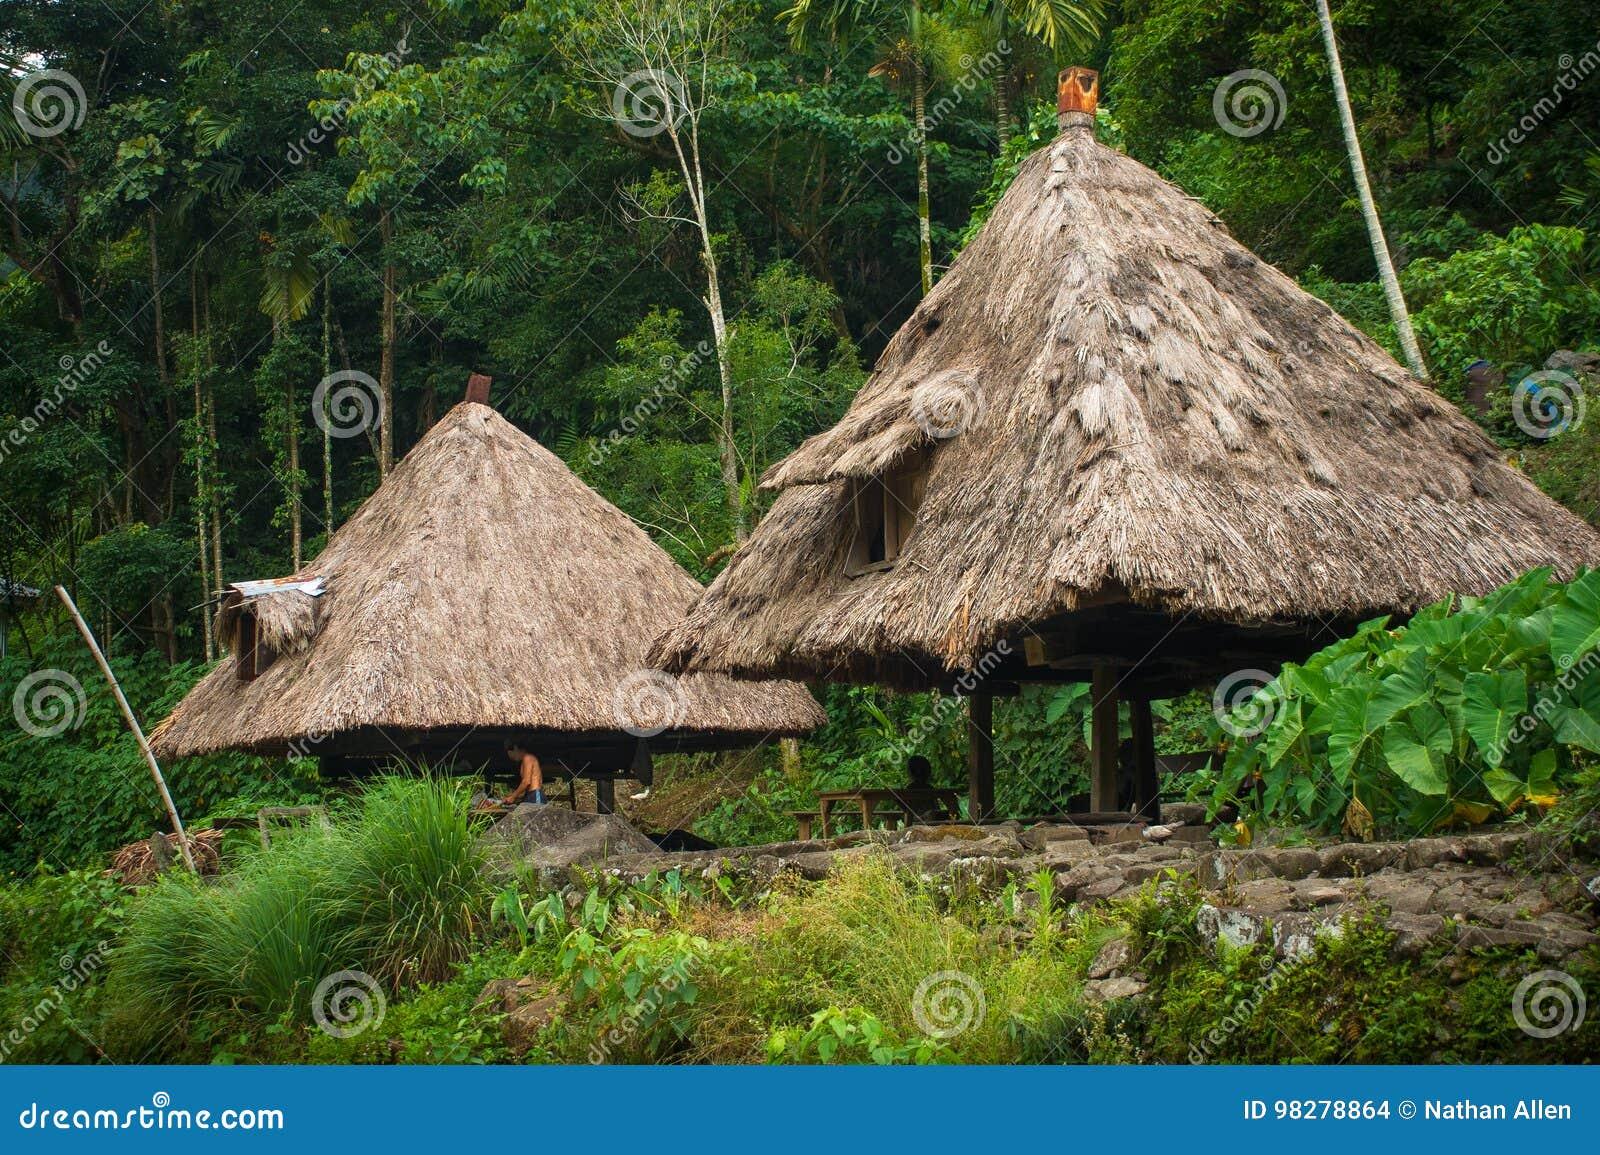 Batad Village - Ifugao, Philippines - July 16, 2013:Native Ifugao village huts in Batad, in Luzon, Philippines